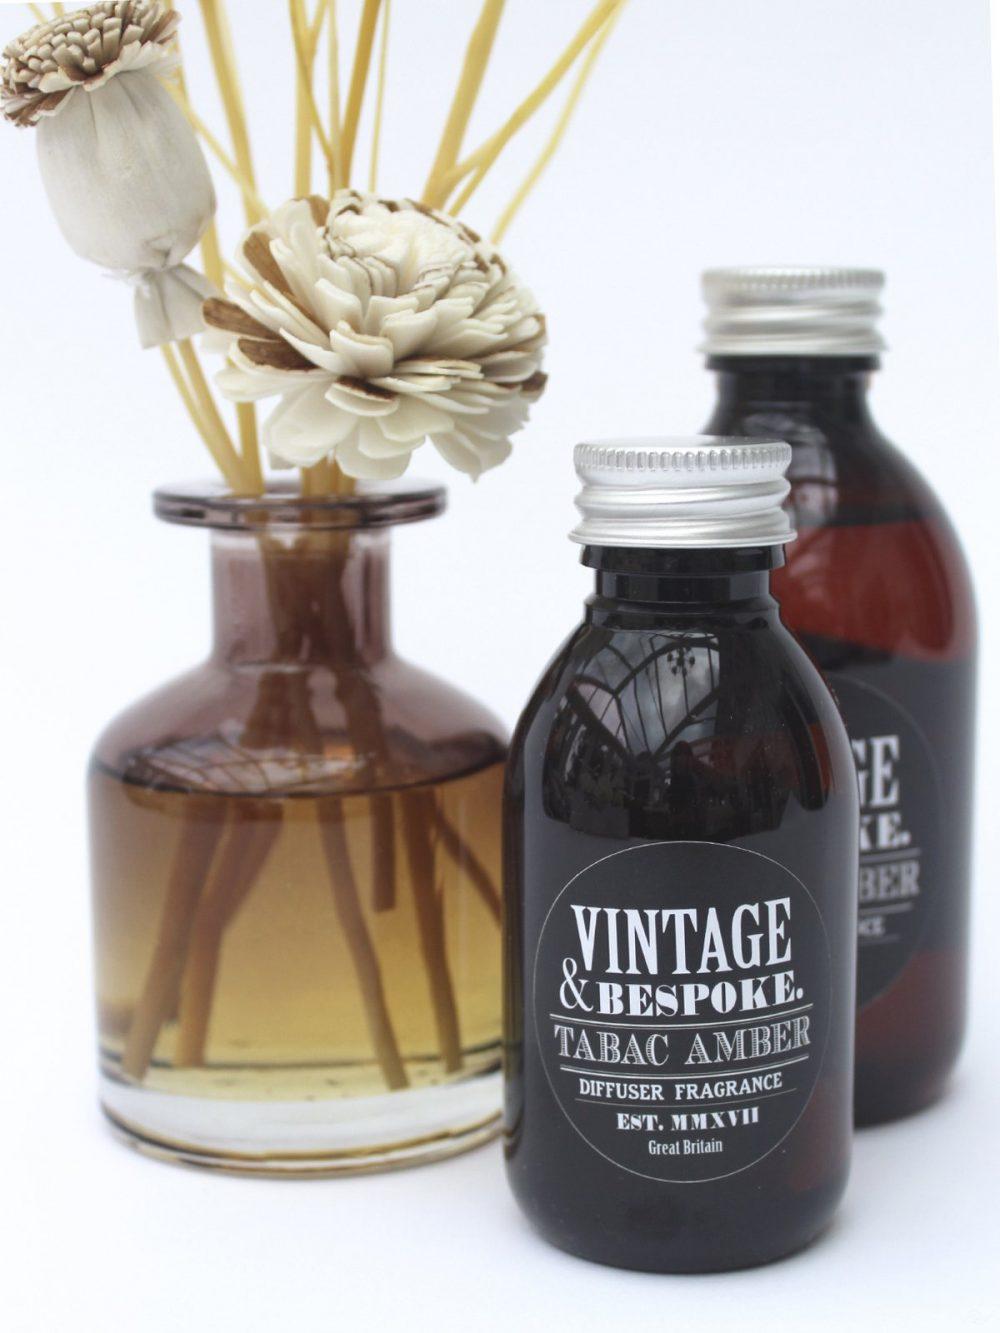 Genderless universal room fragrance Tabac Amber from Vintage and bespoke ltd